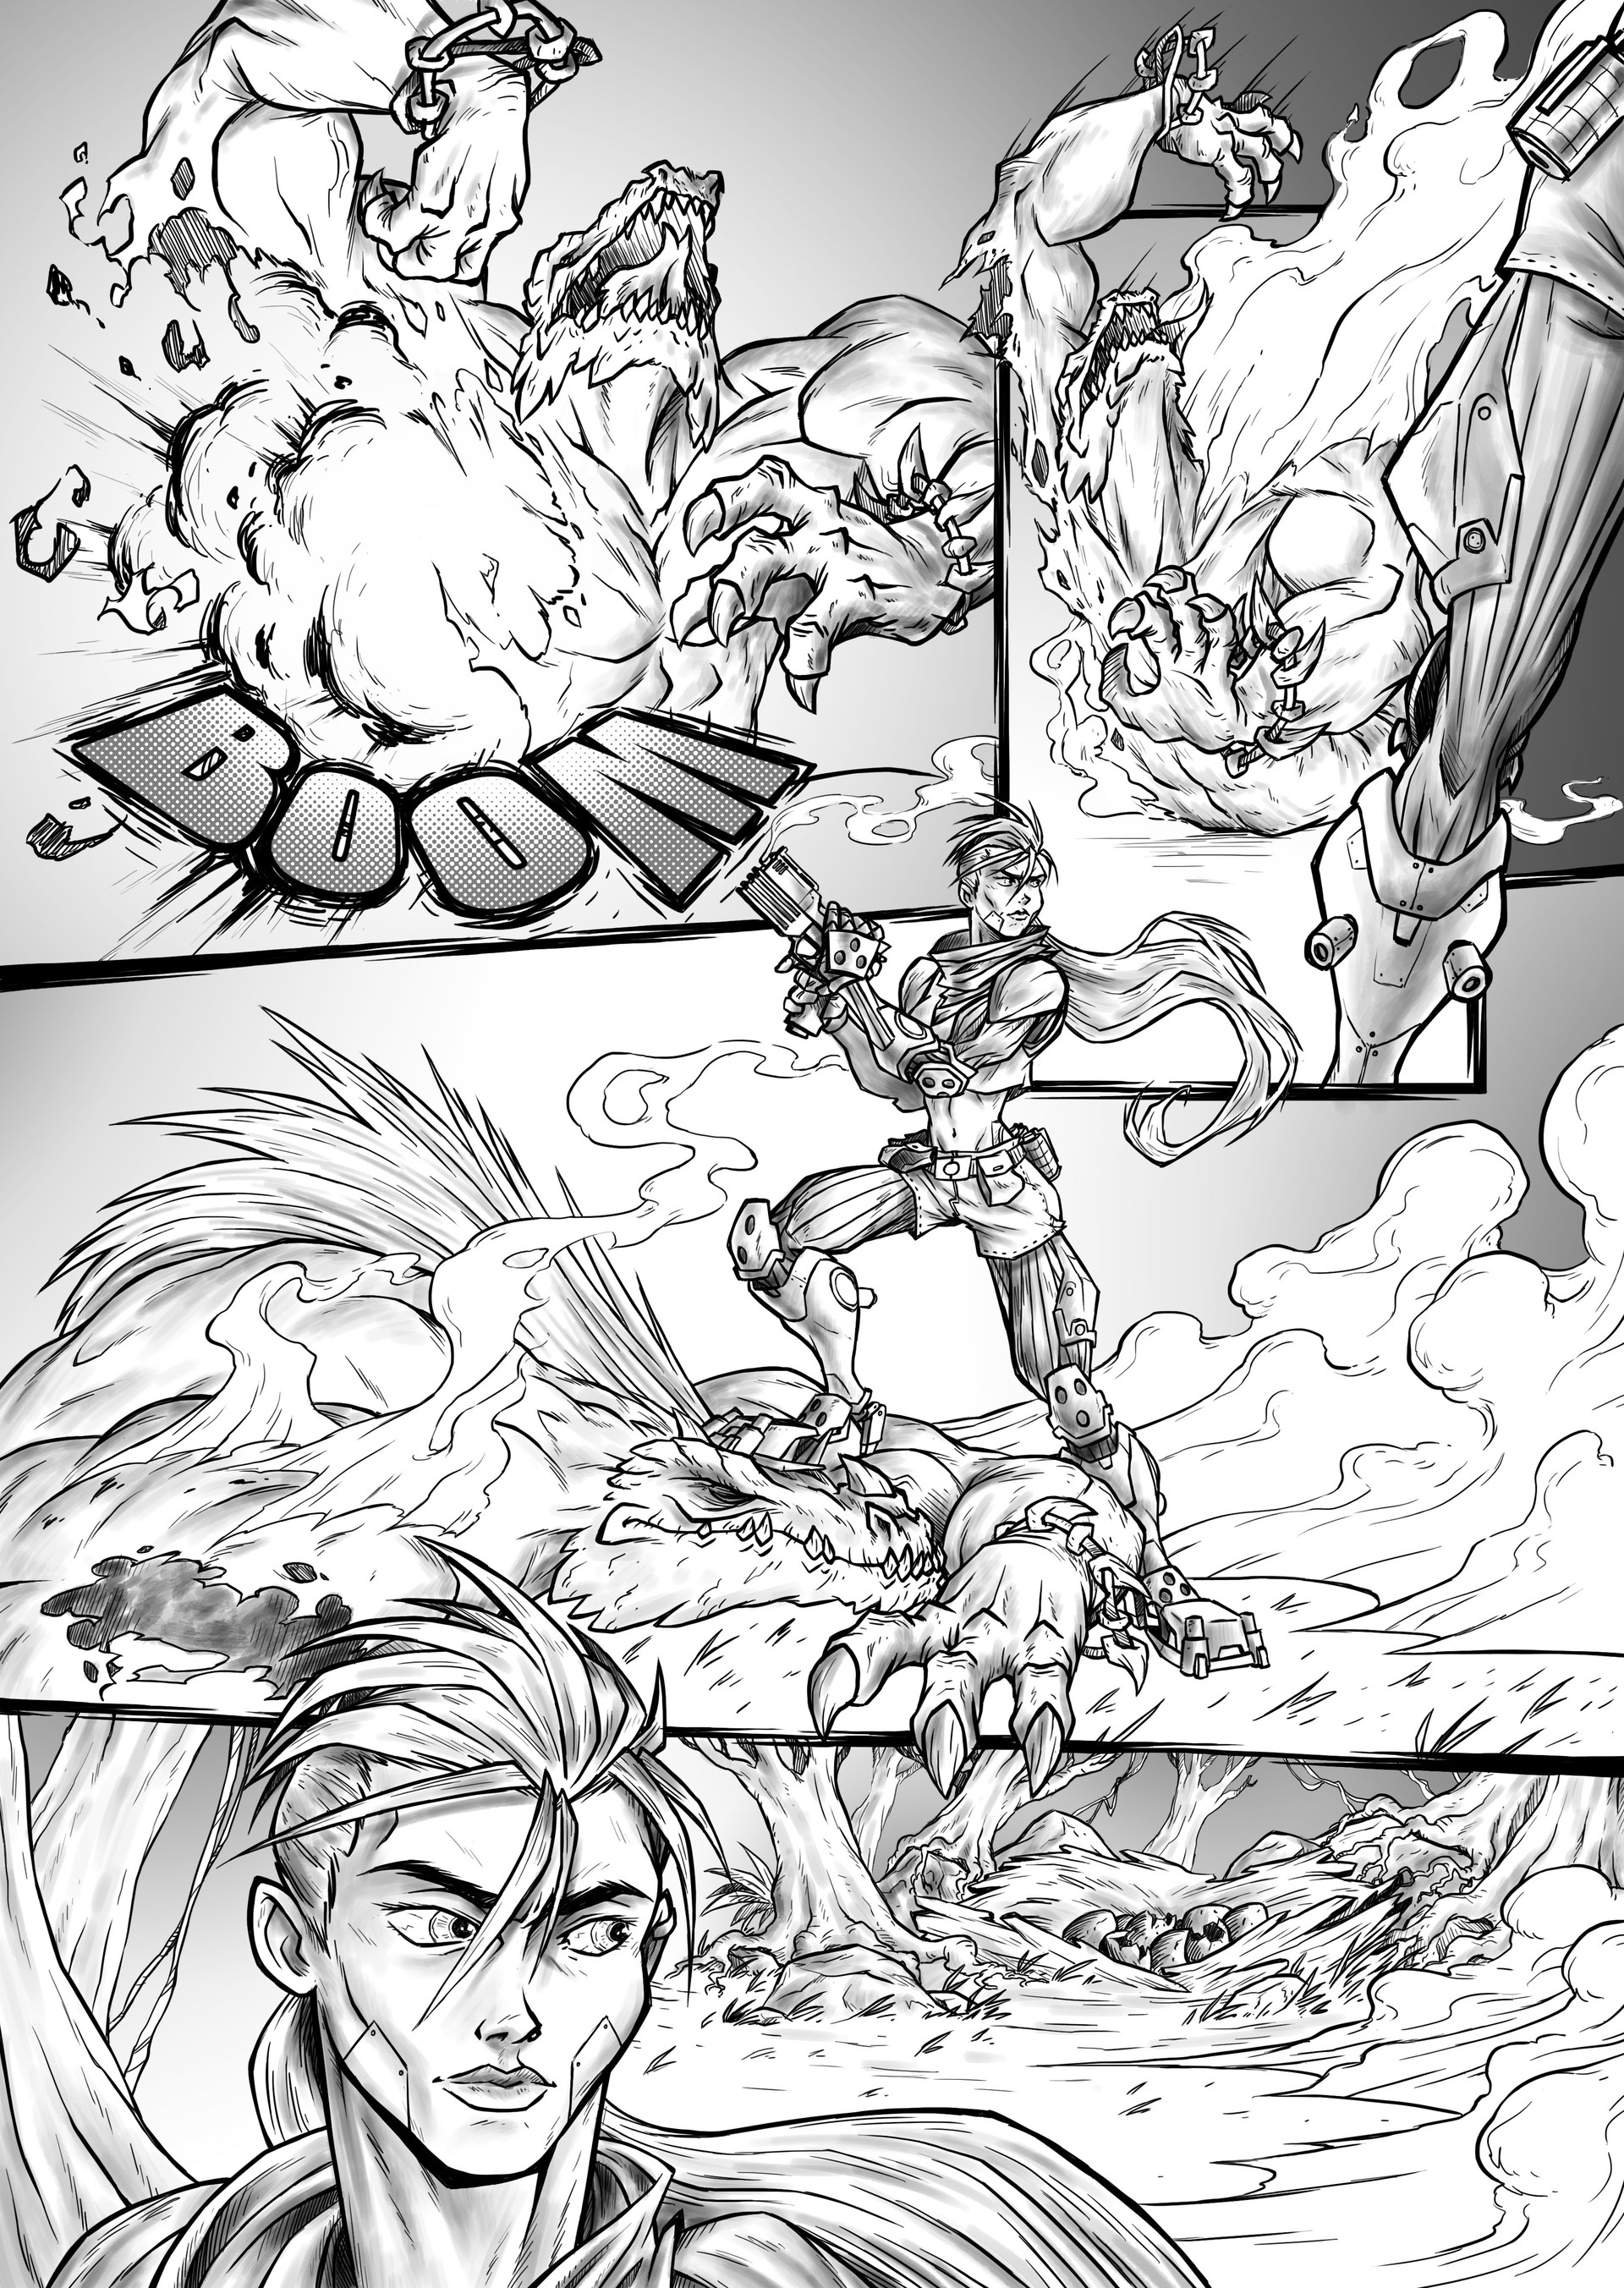 Max haig bounty huntrer page6